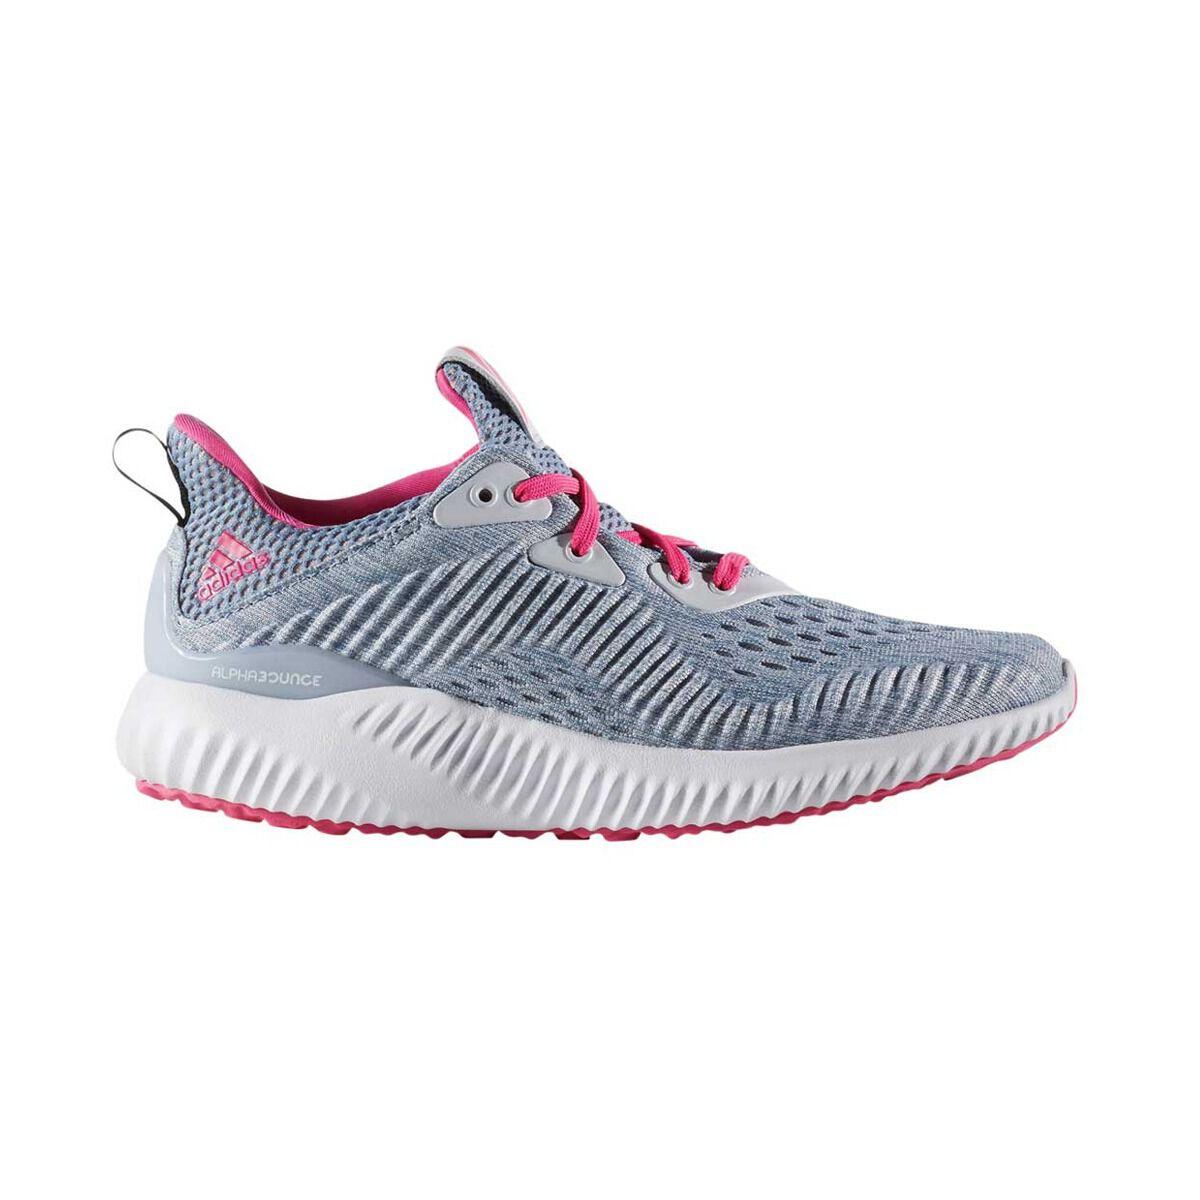 adidas Alphabounce EM Shoe Kid's Running